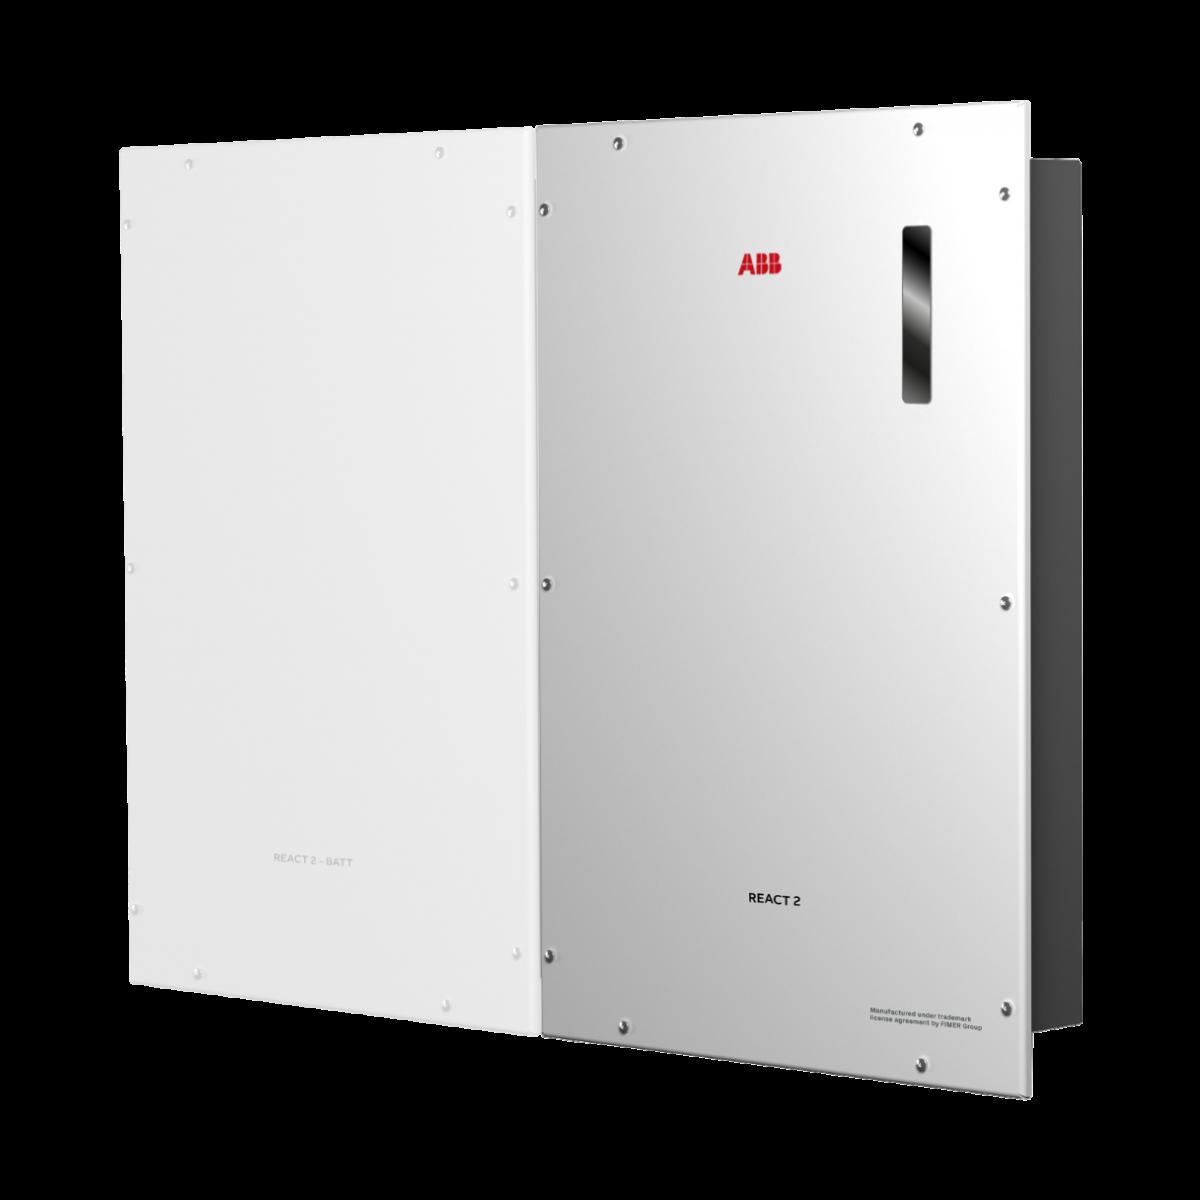 ABB REACT2-UNO-5.0-TL   Hybride Omvormer   5 kW, 1PH